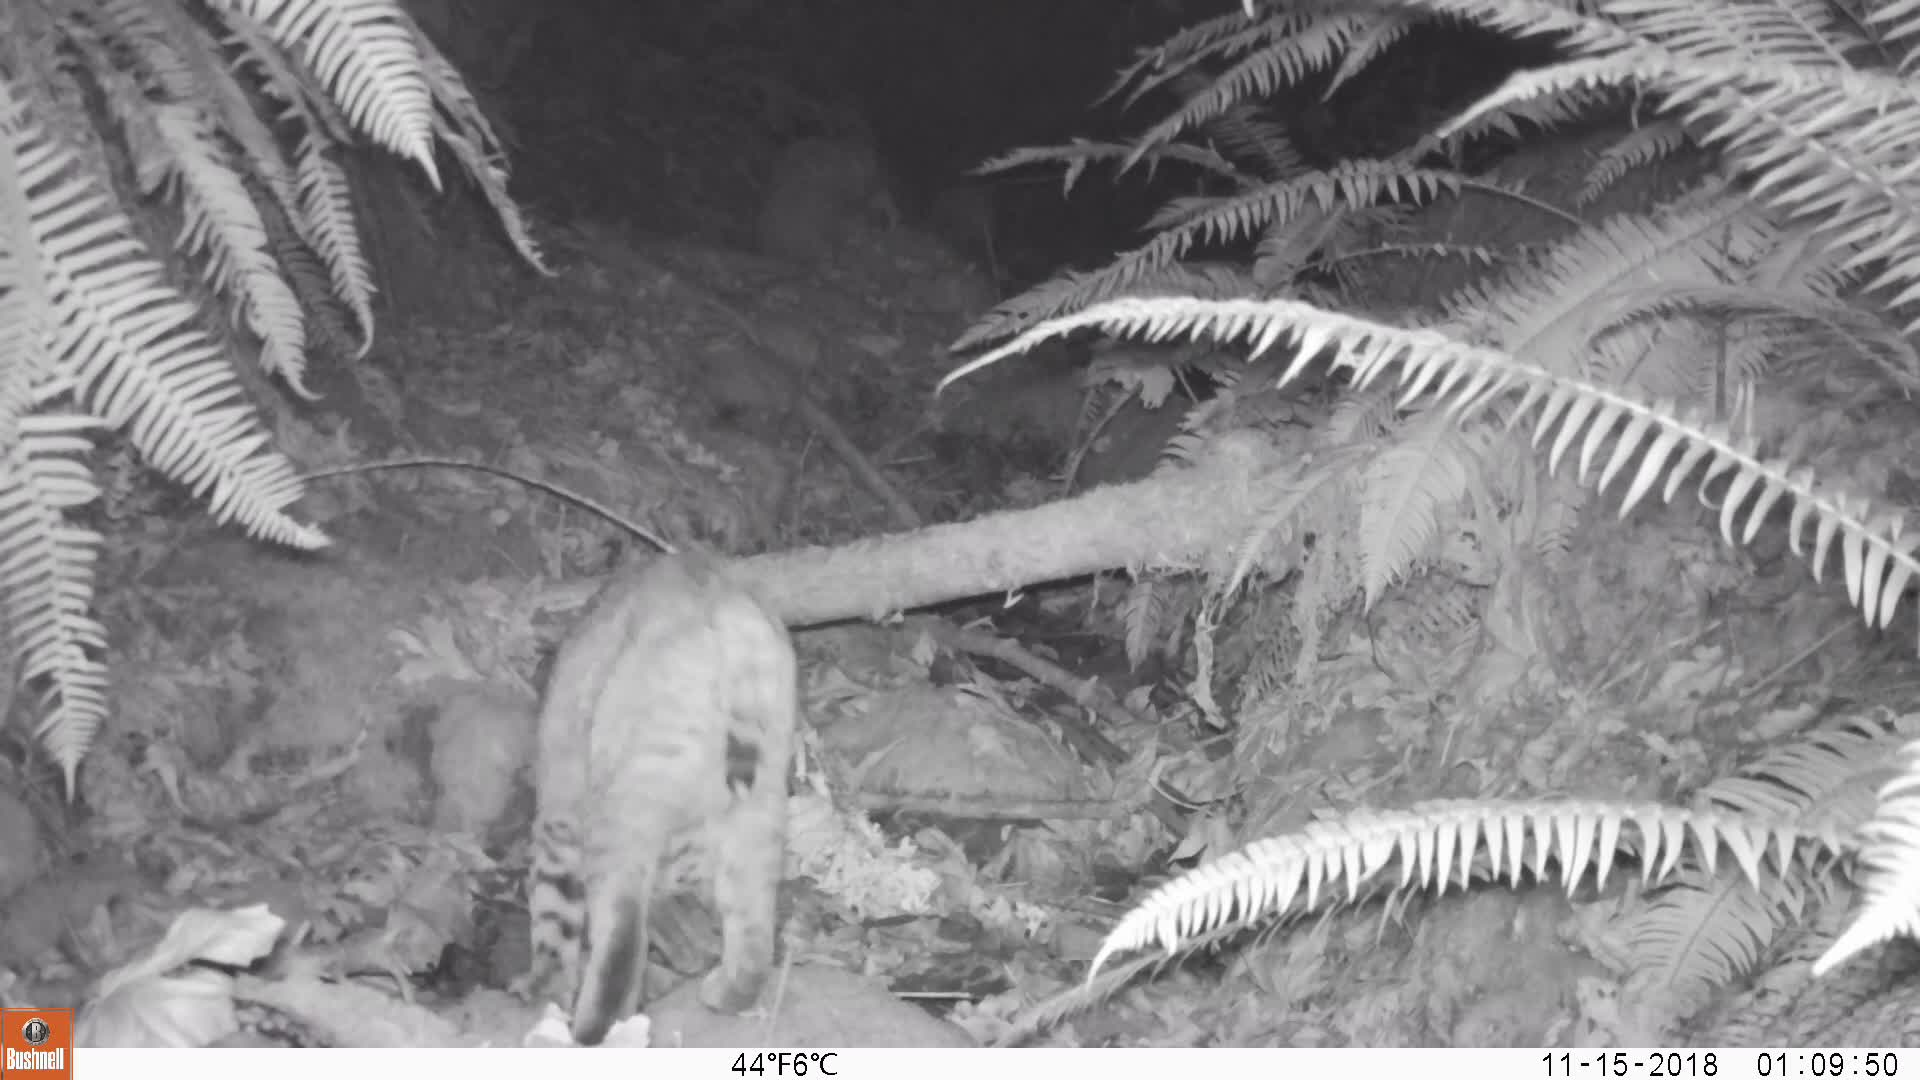 natureismetal, Bobcat kills Opossum GIFs